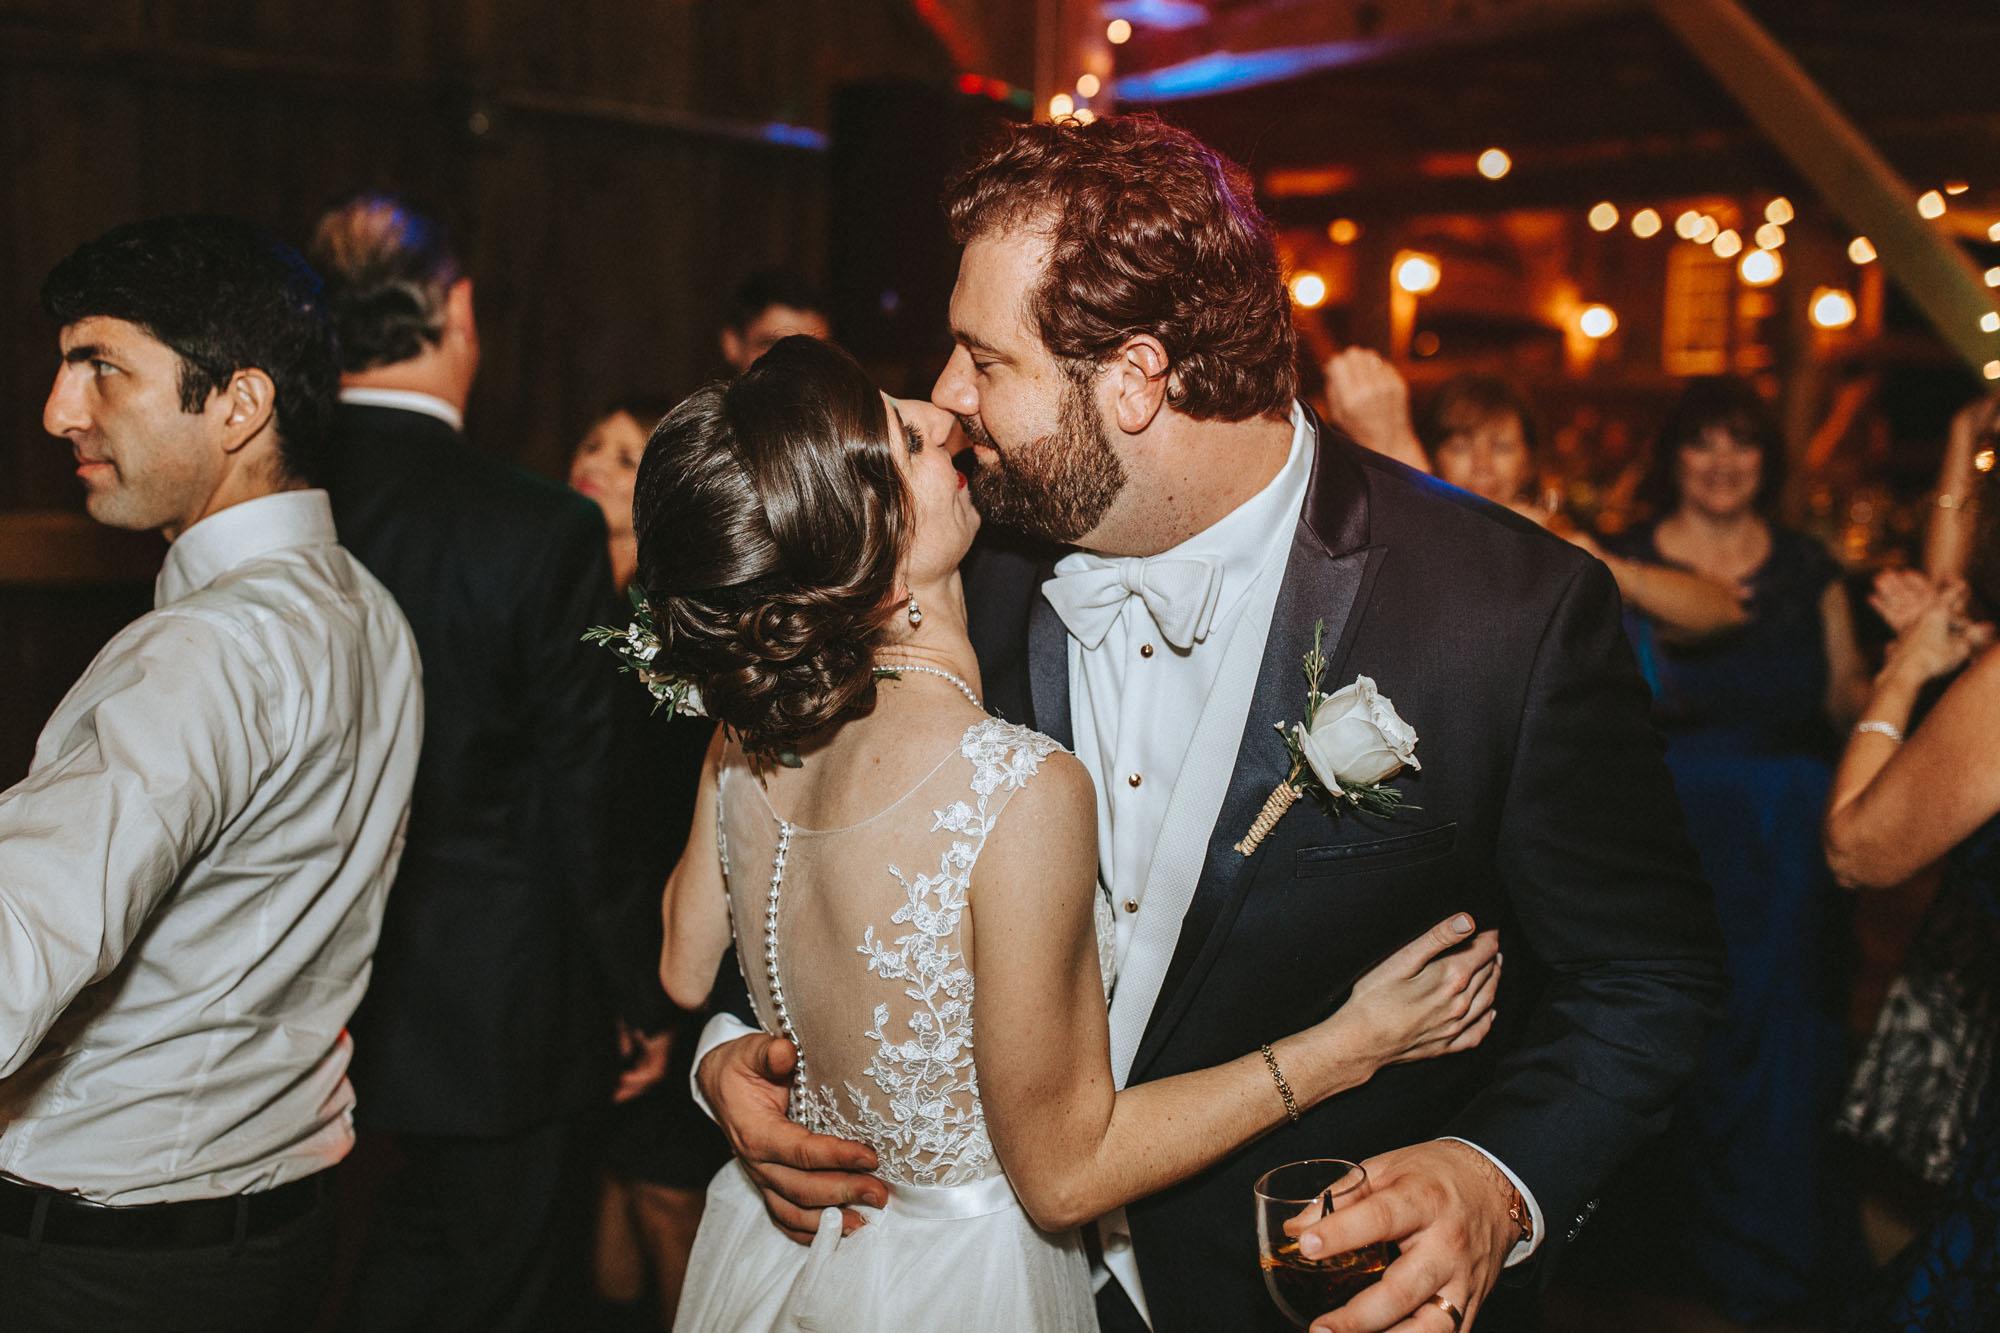 Twisted-Oaks-Studio-Arianne-Sean-Wedding-550.jpg